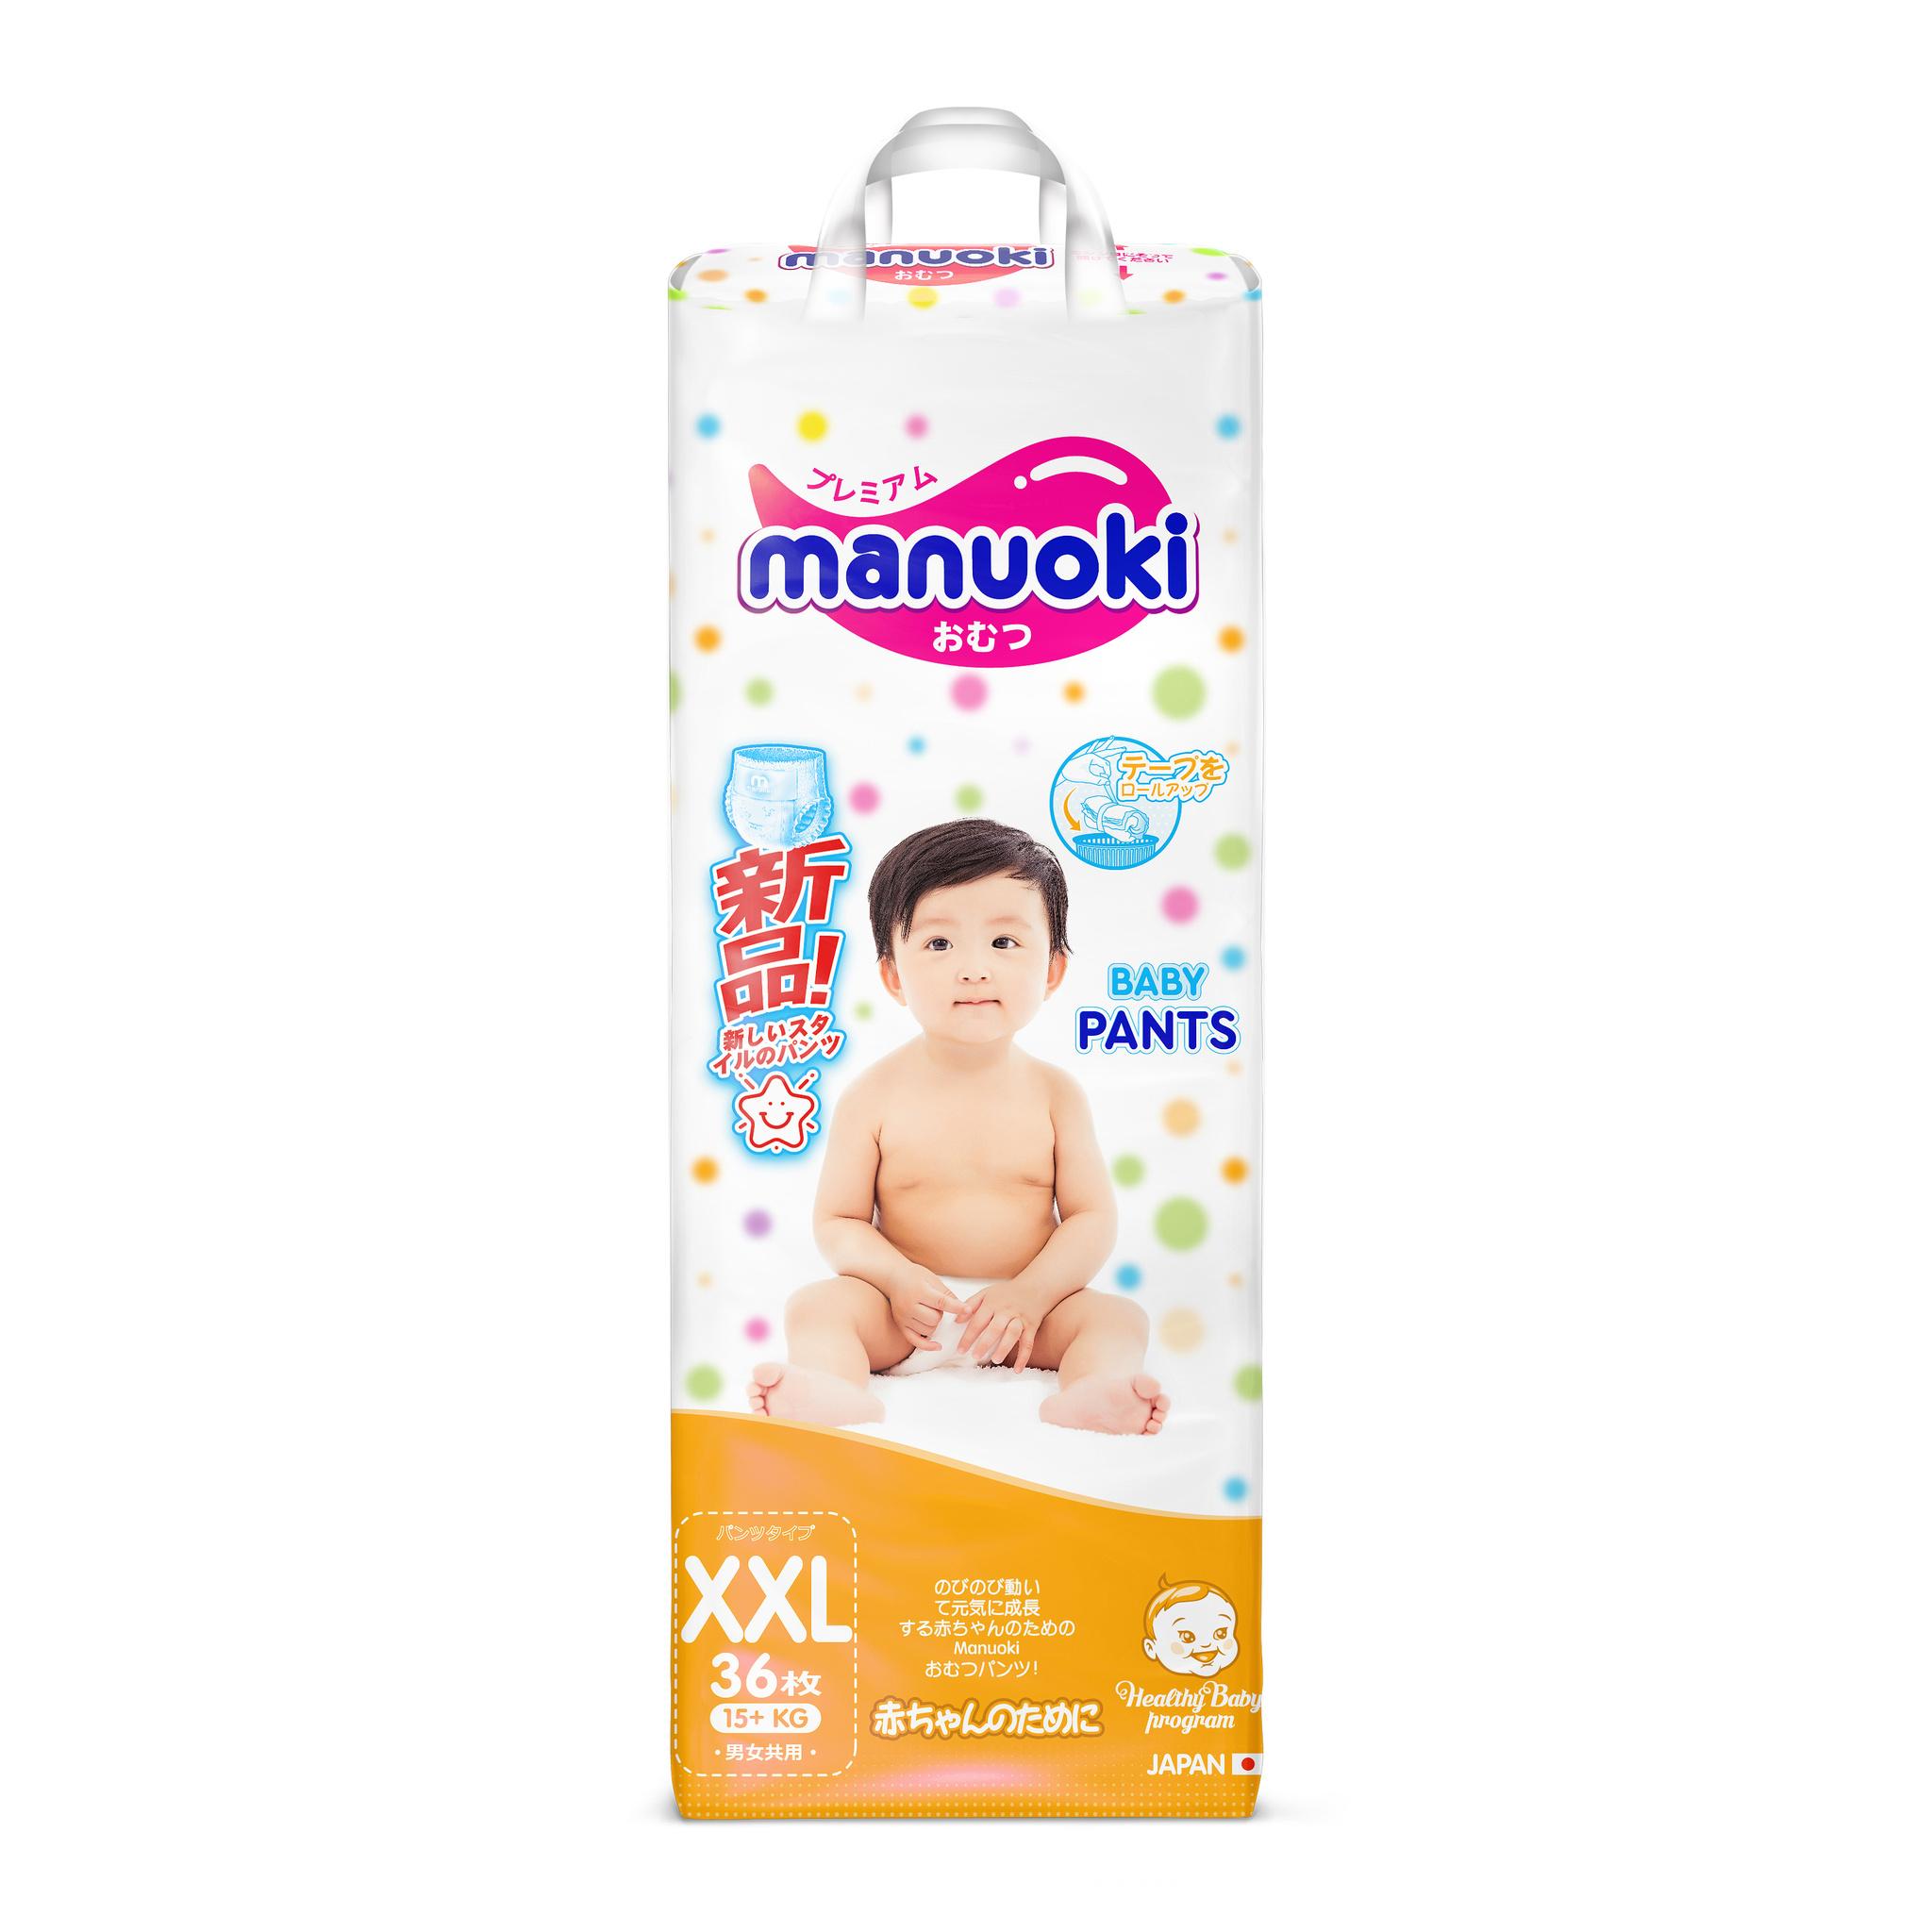 Подгузники-трусики Manuoki XXL 15+ Кг 36 шт Manouki Pants